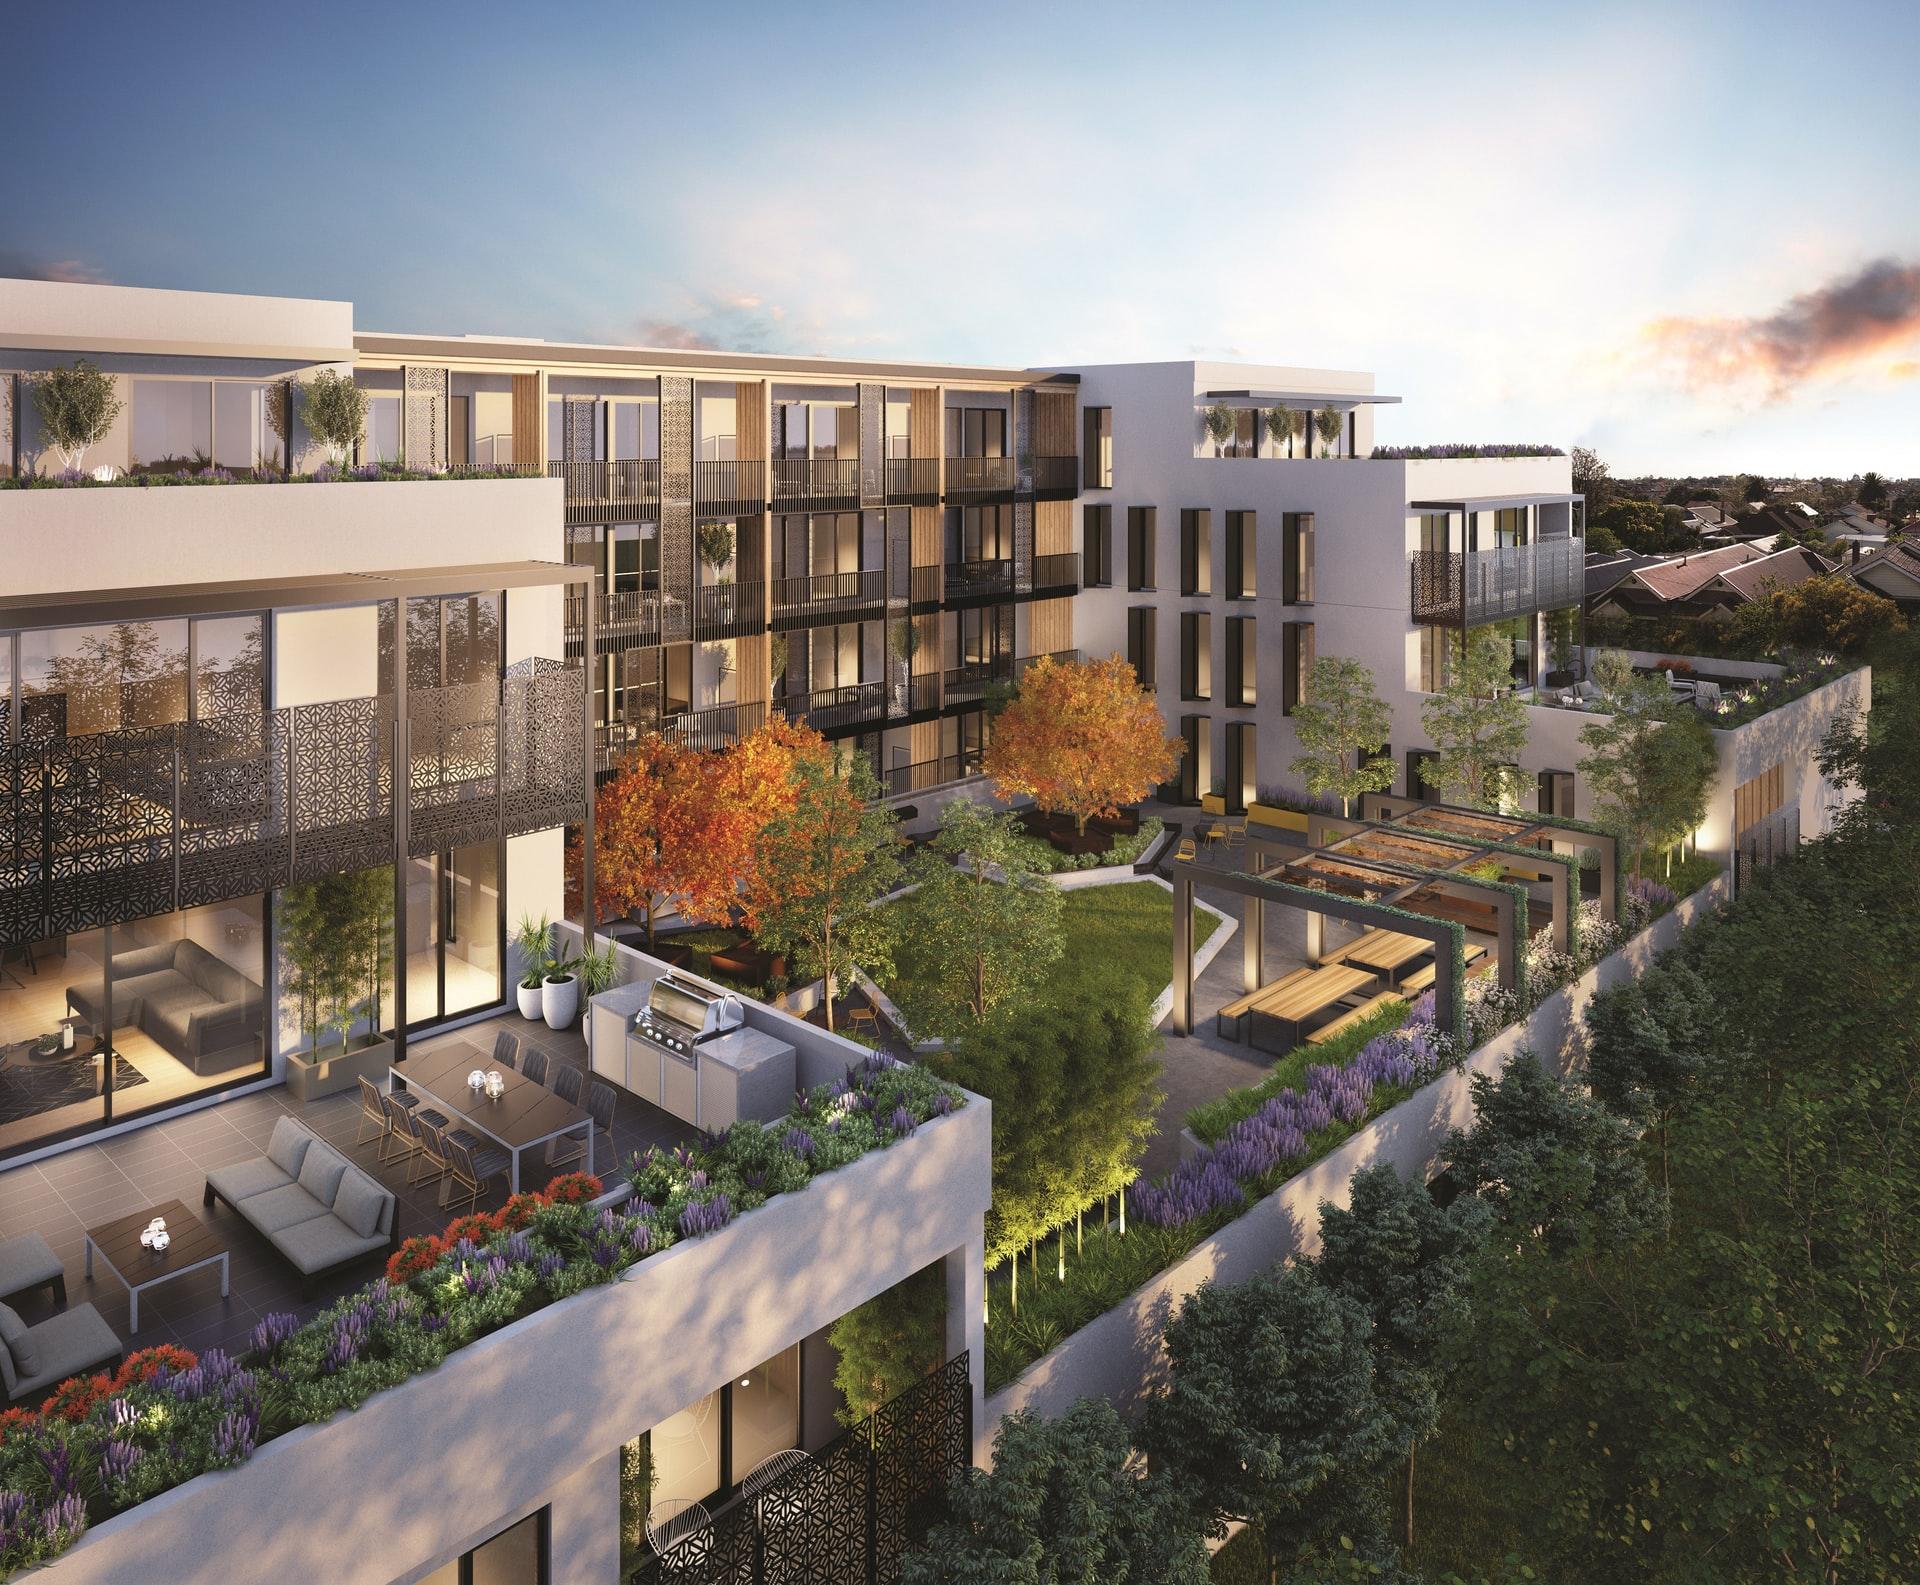 KC multifamily landlord: Lenders limit flexibility on rent breaks